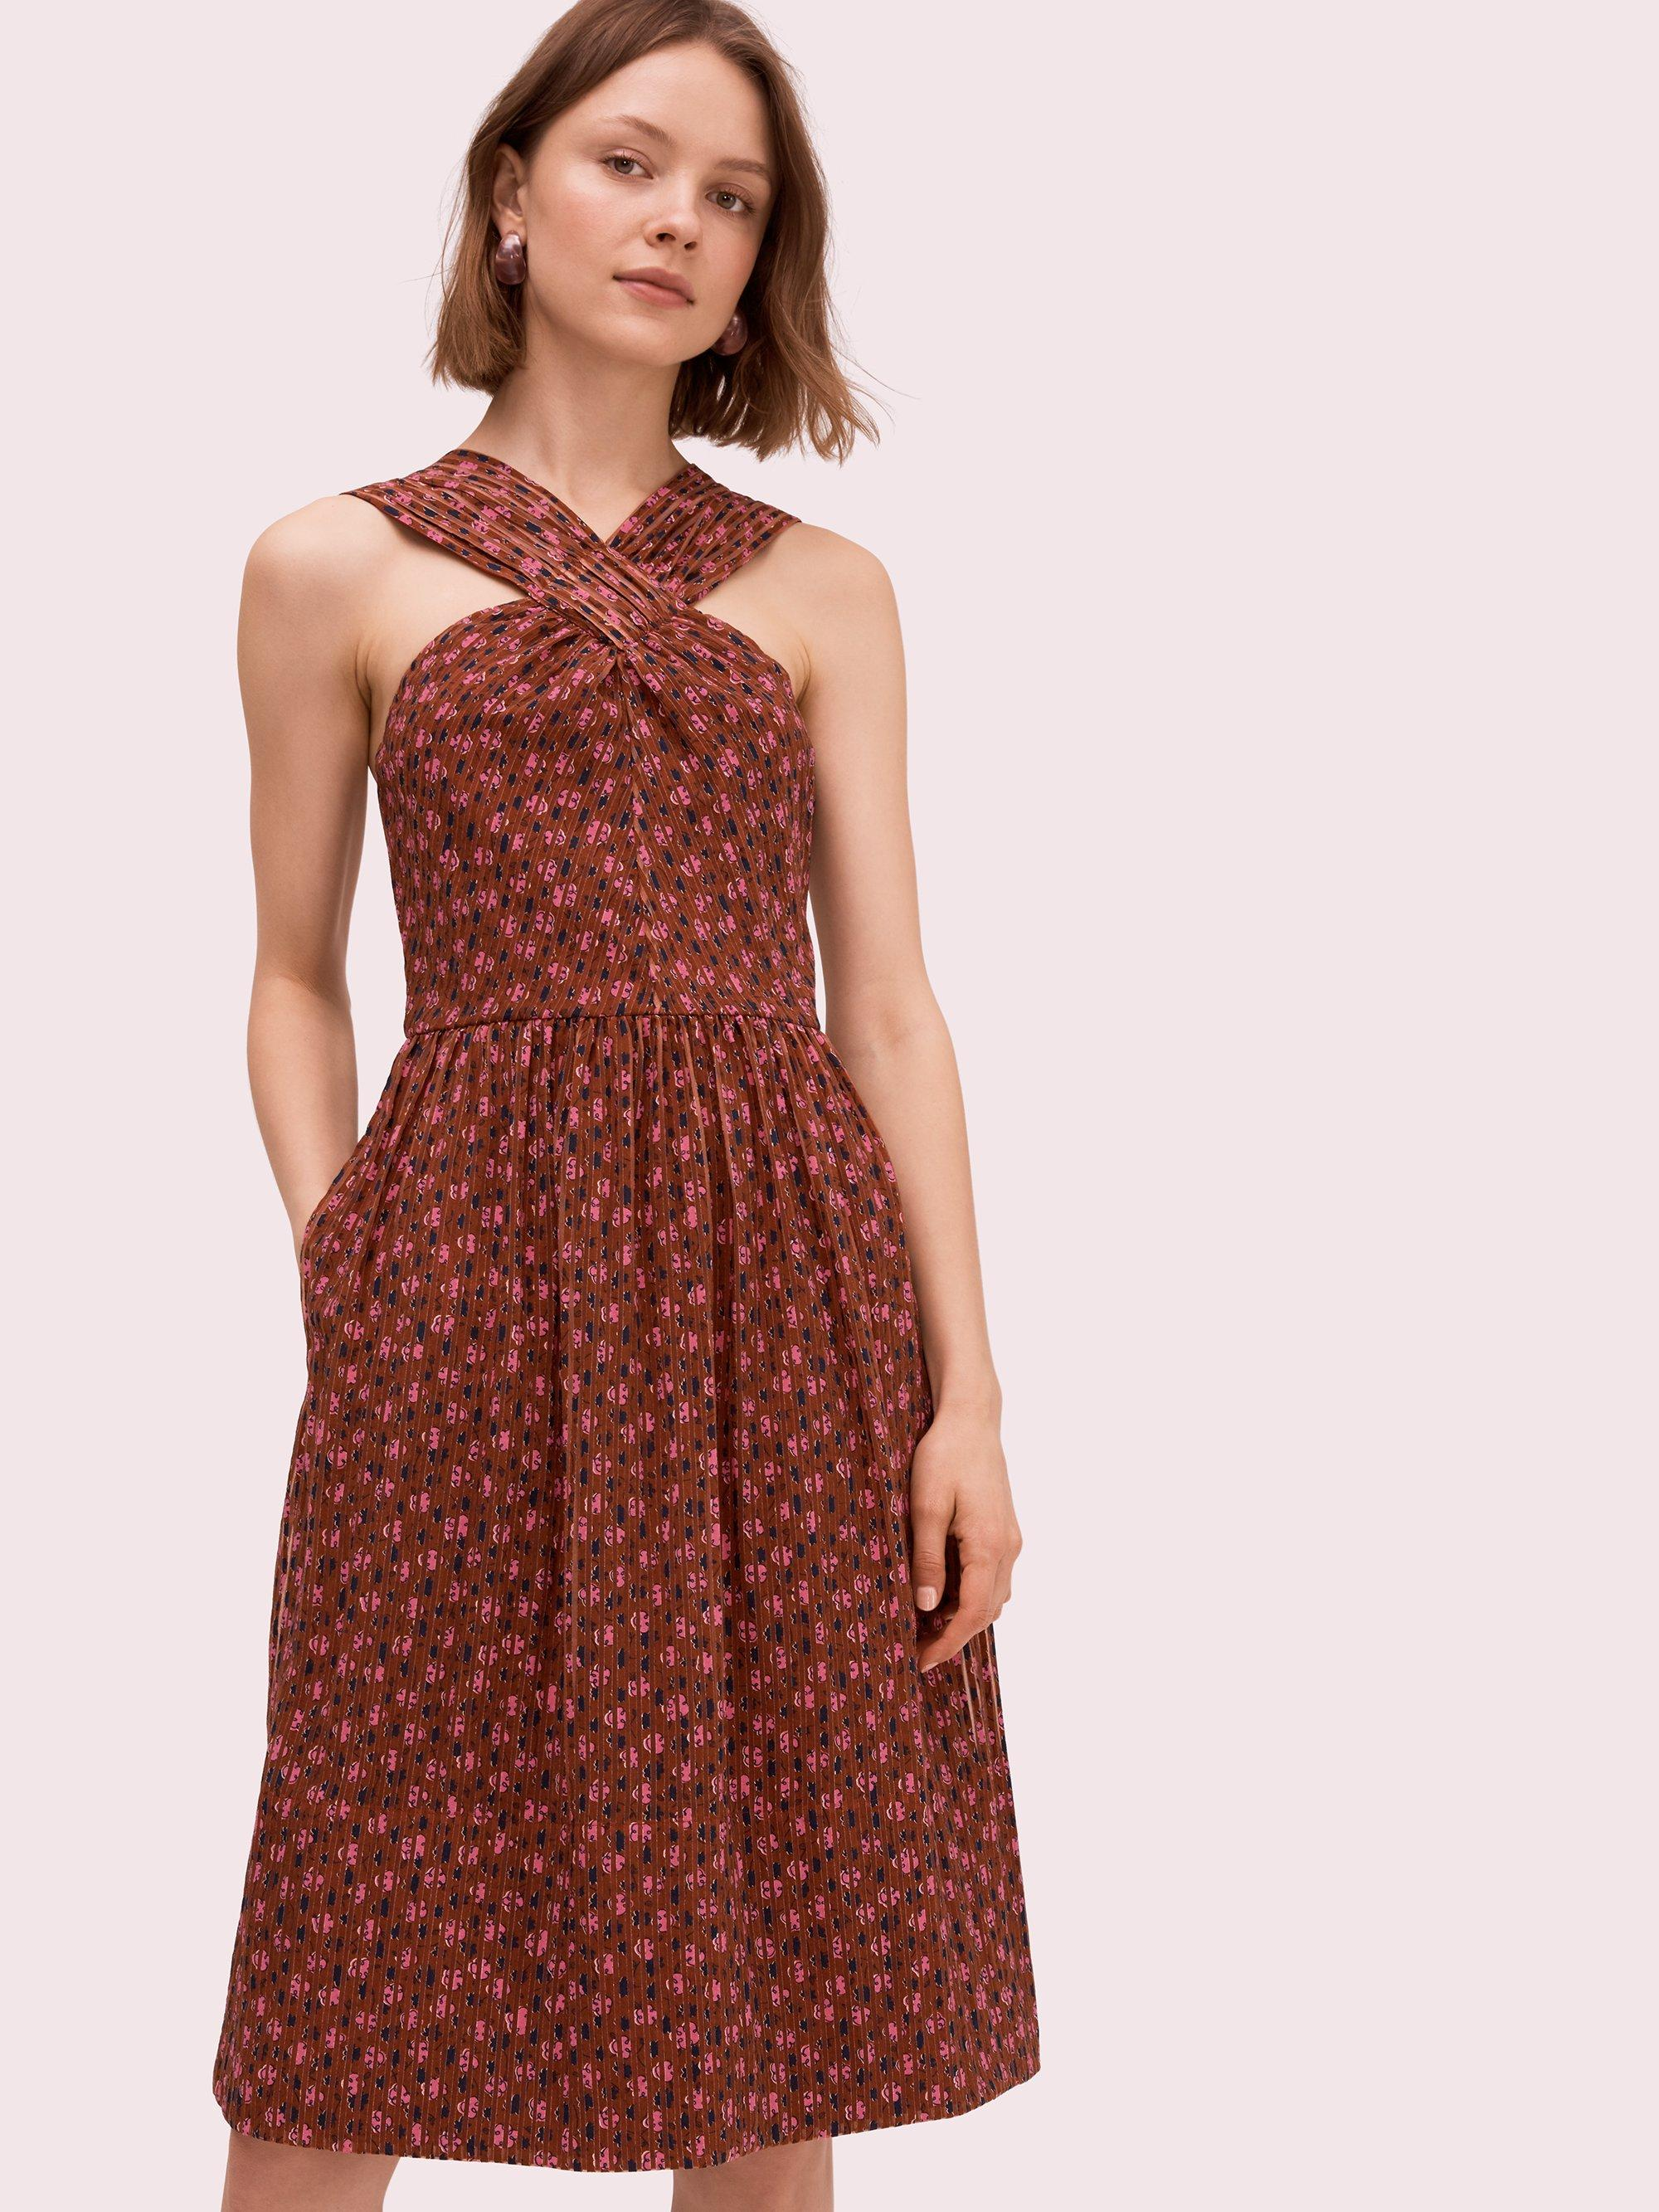 366ab341351c Kate Spade Floradoodle Halter Dress in Red - Lyst